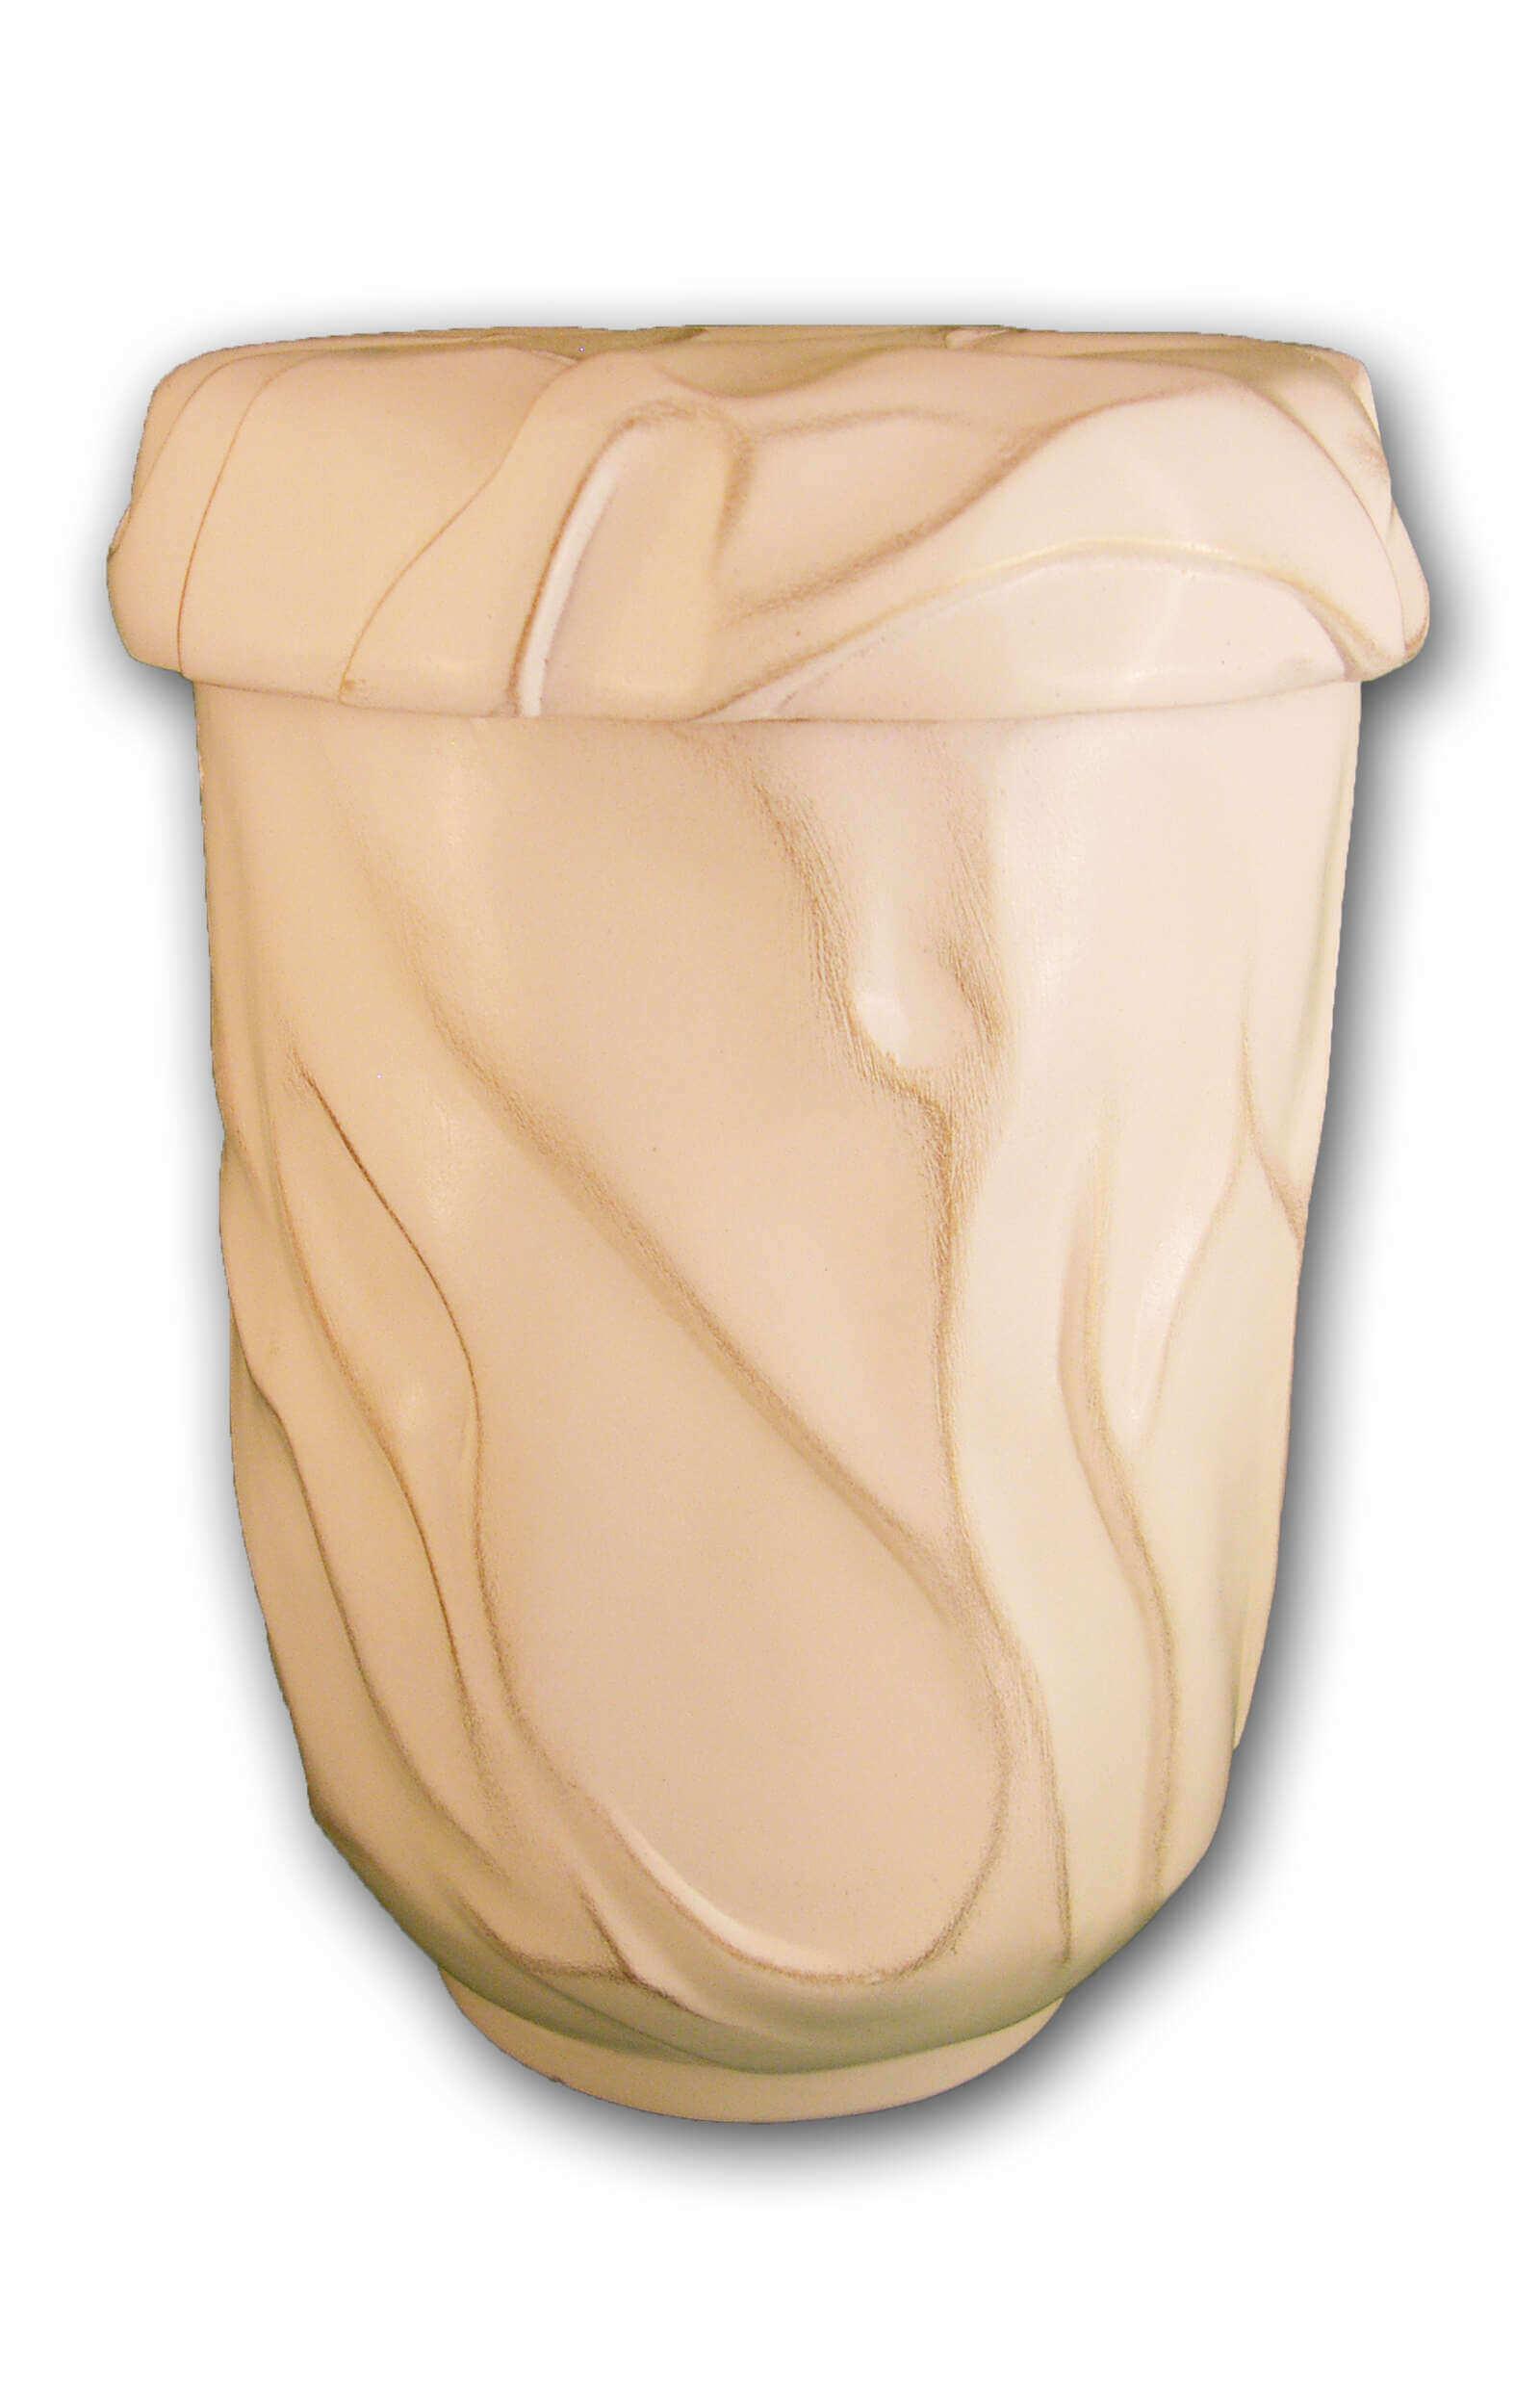 en KW1532 ceramic urn funeral urn for human ashes ocean white